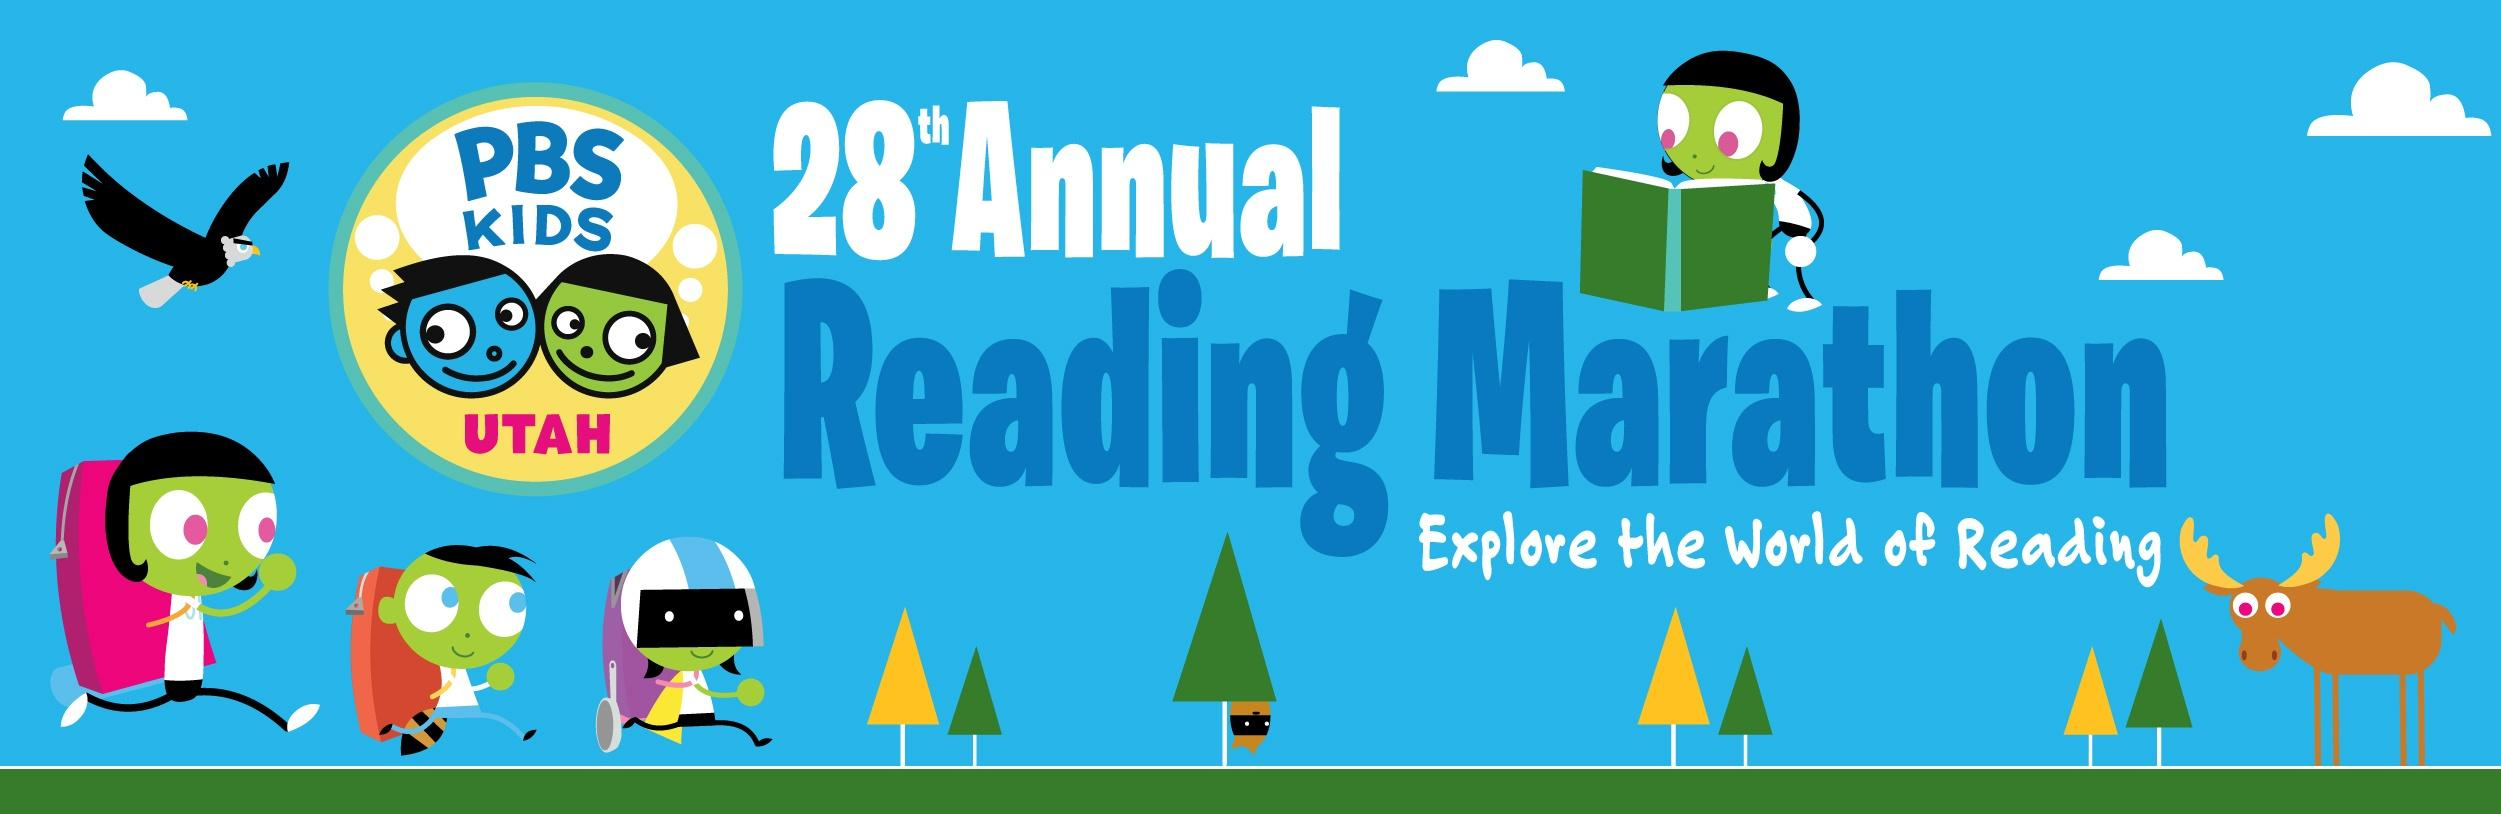 28th Annual Reading Marathon